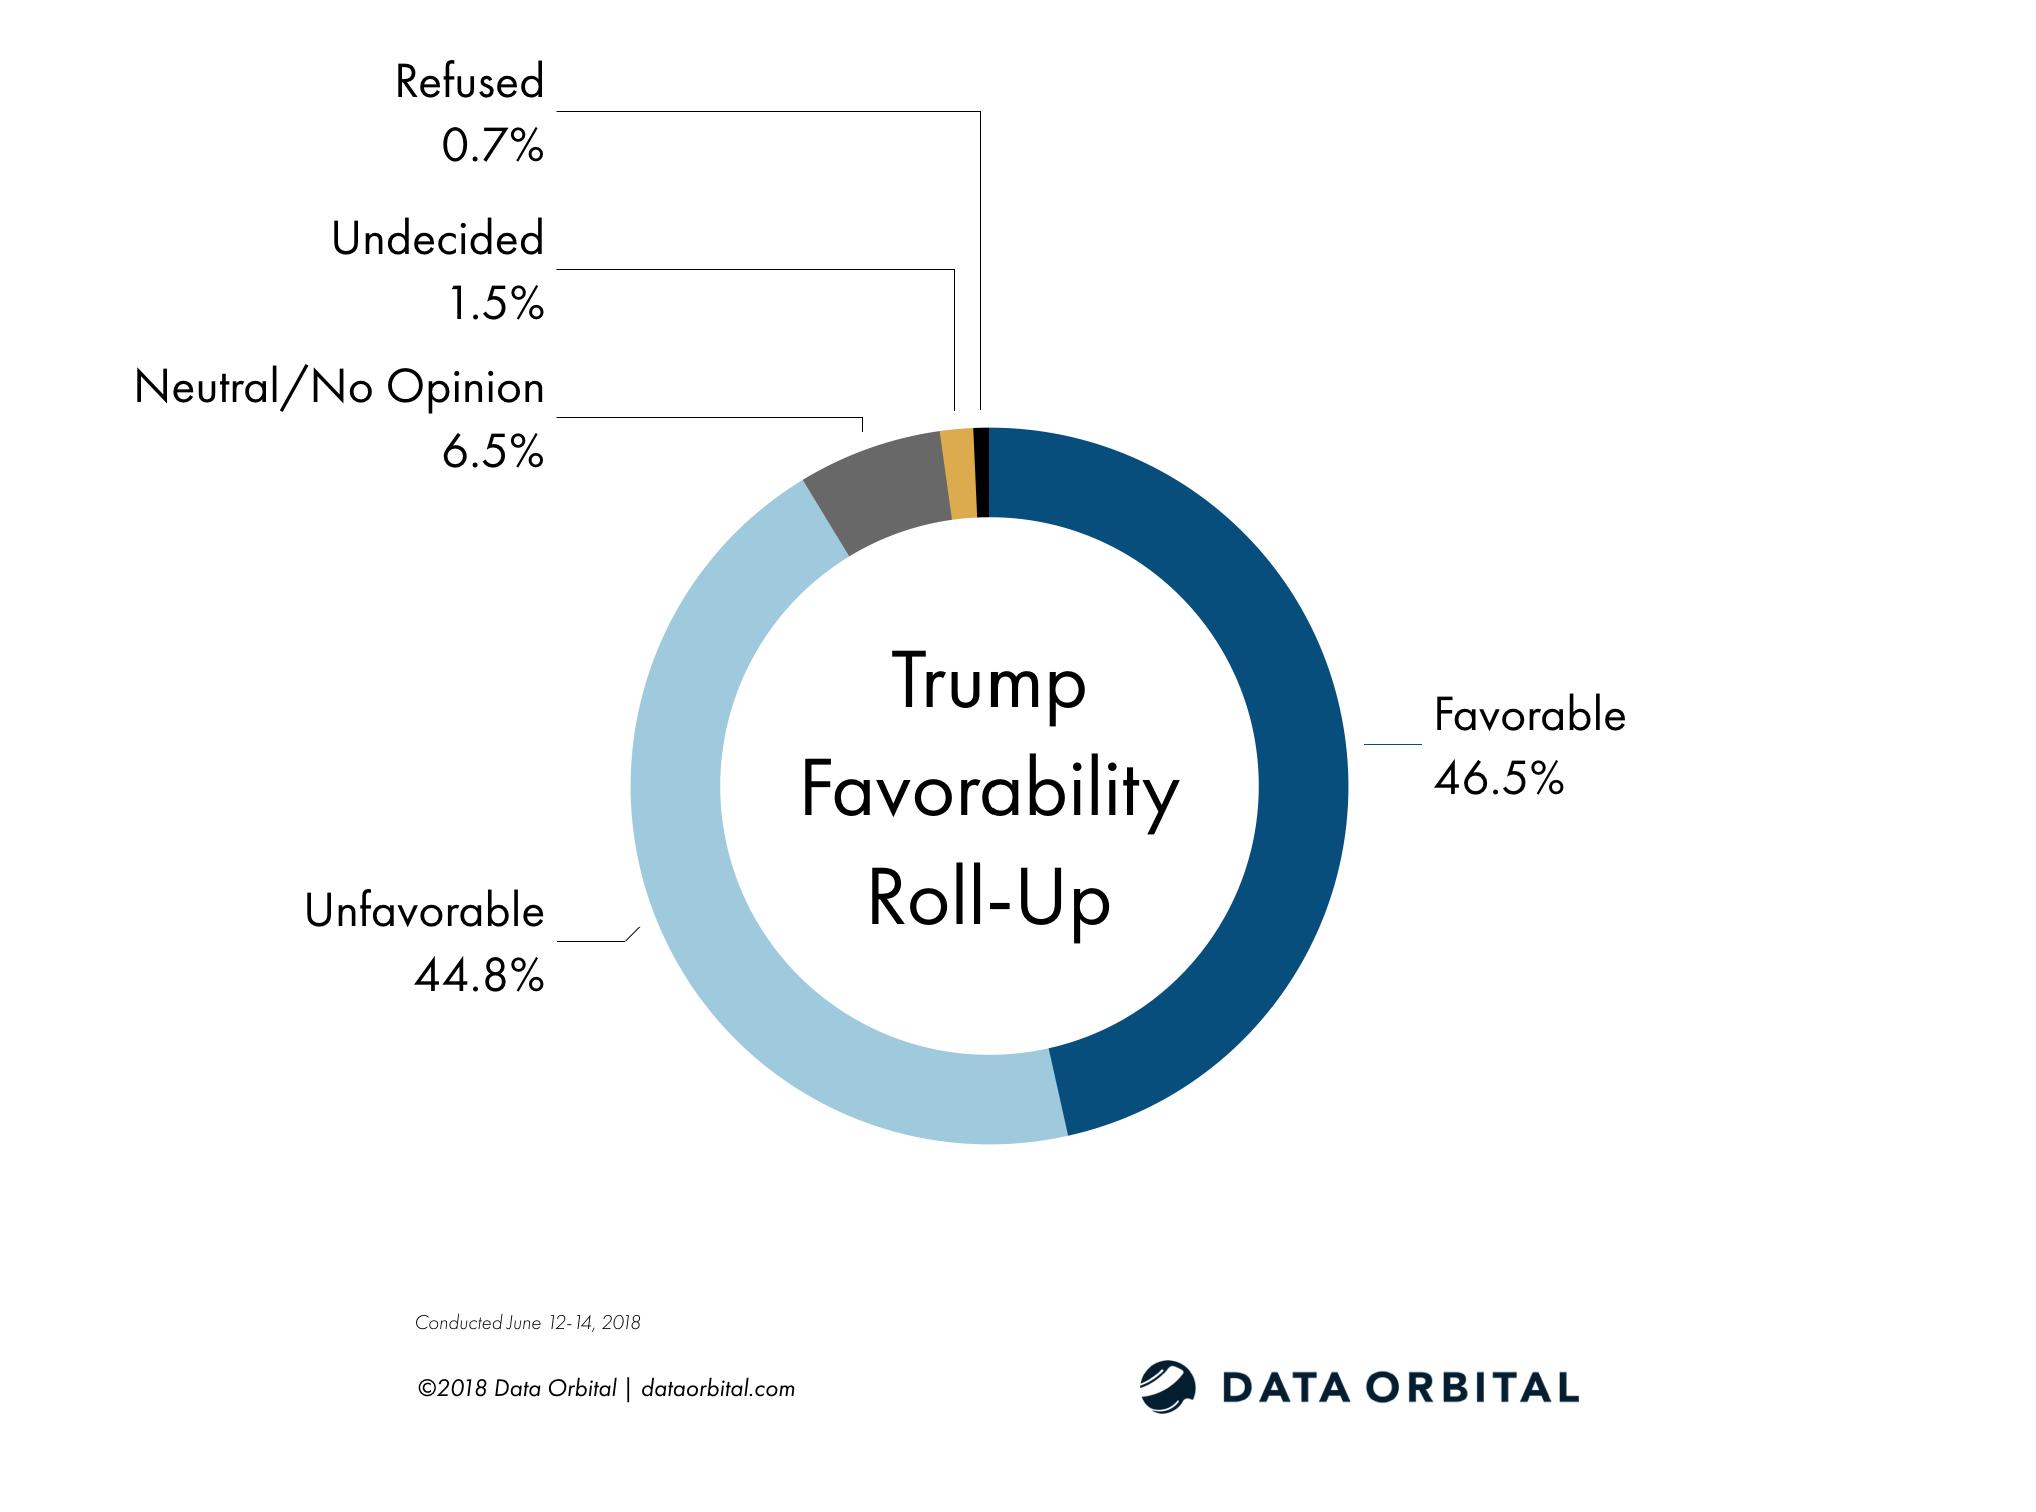 Data Orbital AZ Statewide Survey Poll Trump Favorability Roll-Up June 2018